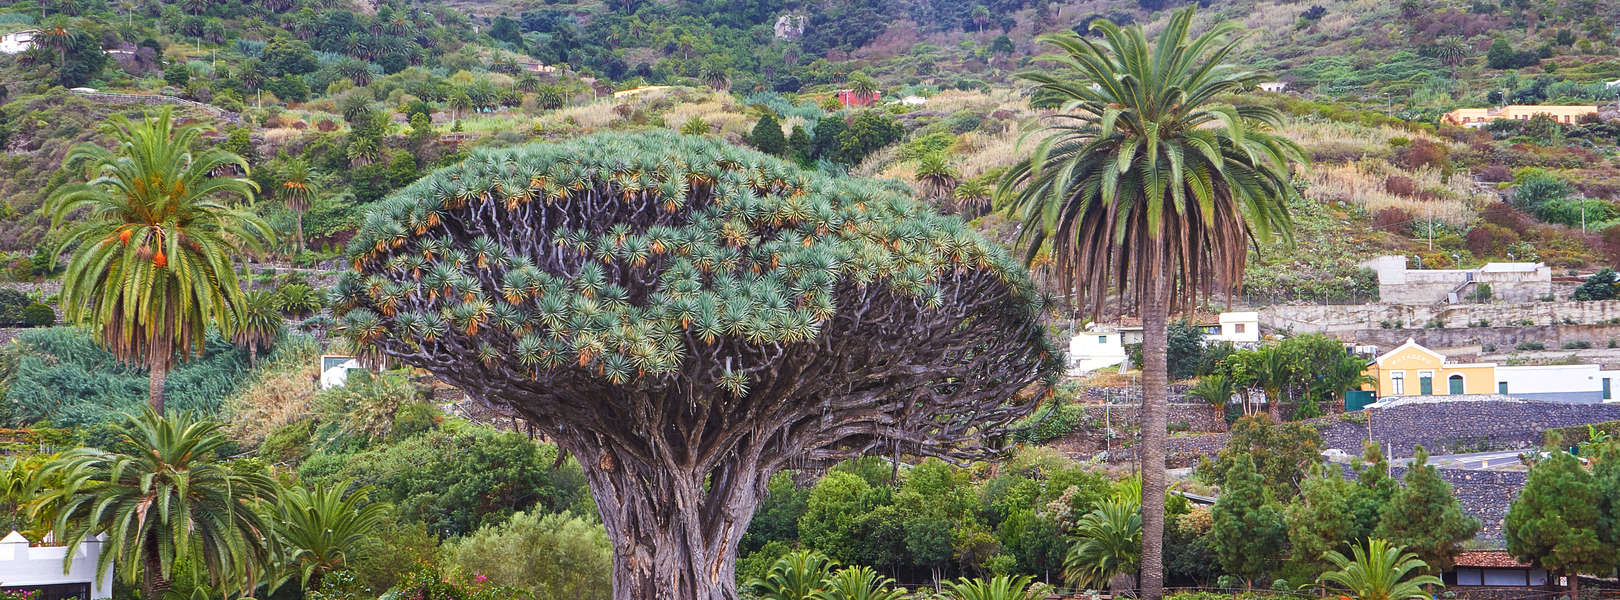 Der berühmte Drachenbaum auf Teneriffa in Icod de los Vinos